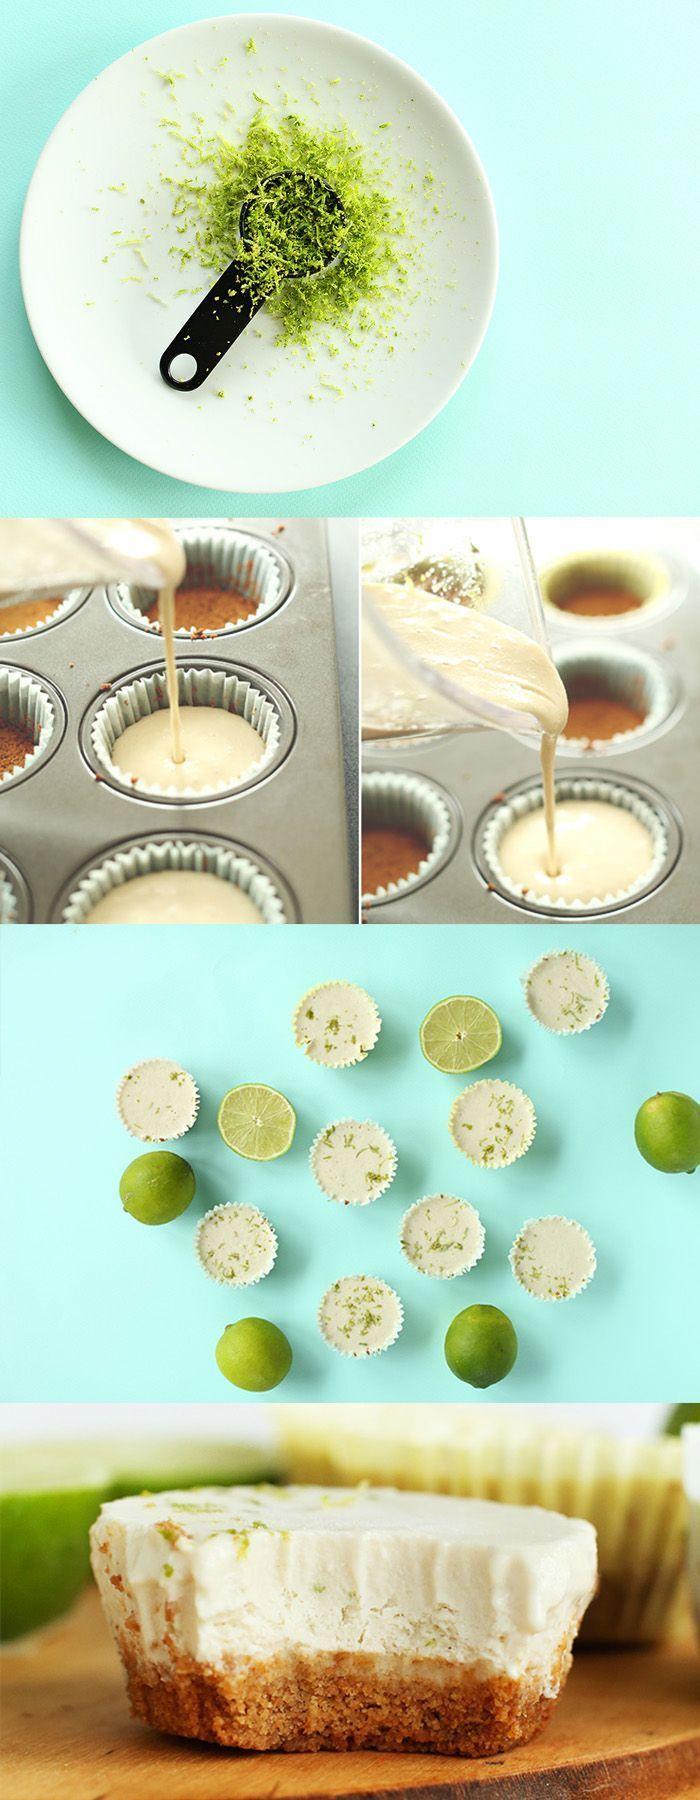 7 Ingredient Vegan Key Lime Pie Bites! Super creamy and delicious, yum!